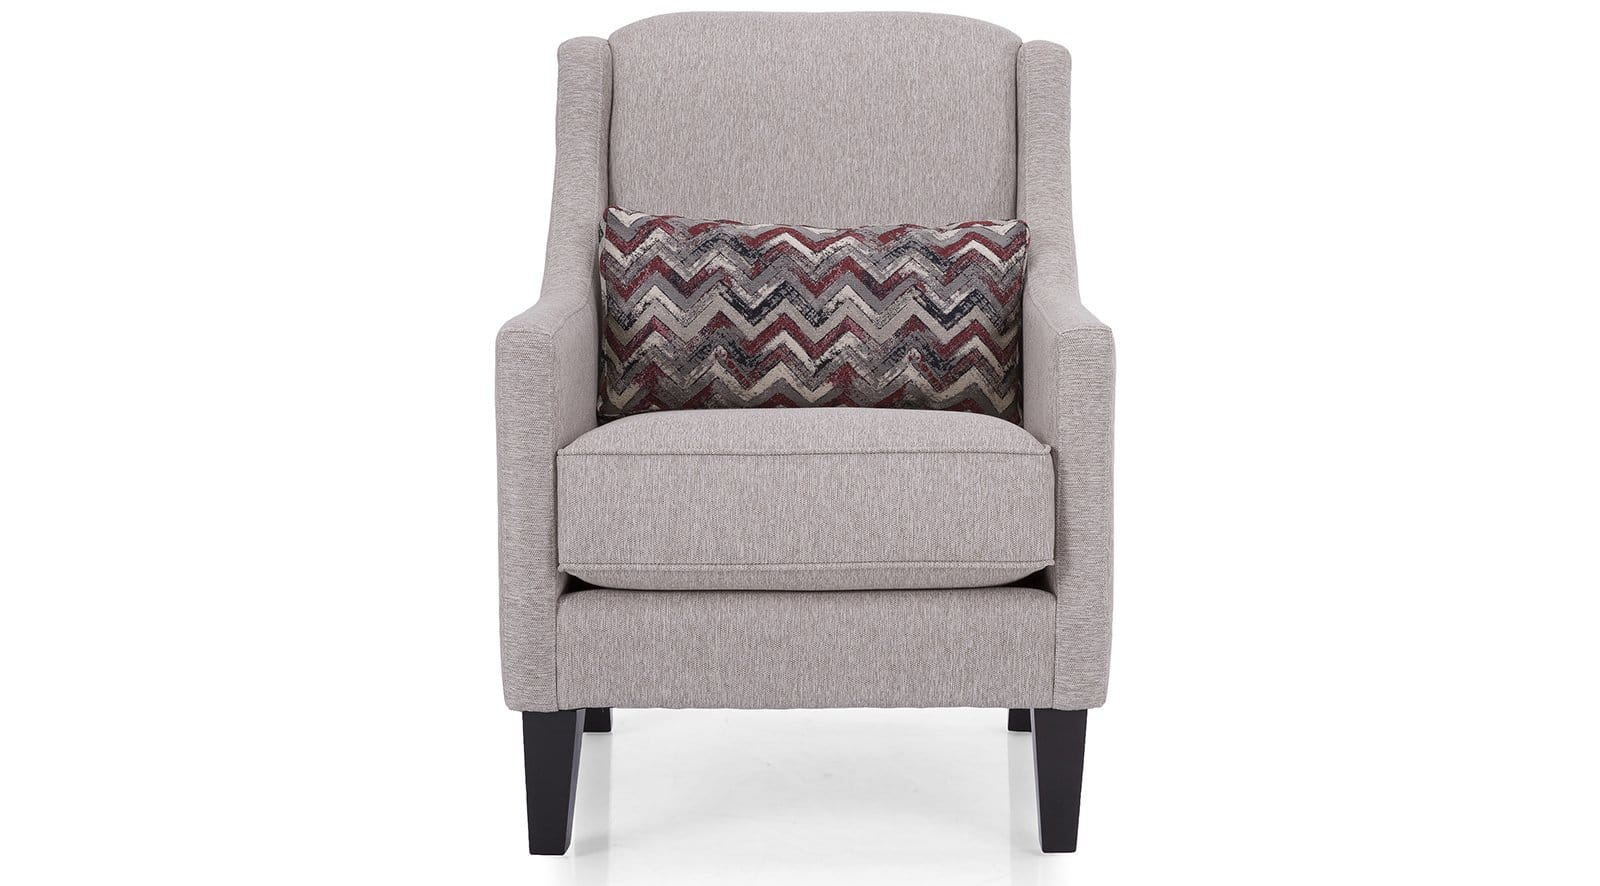 DR-7606C-GR-58-93-Chair.jpg